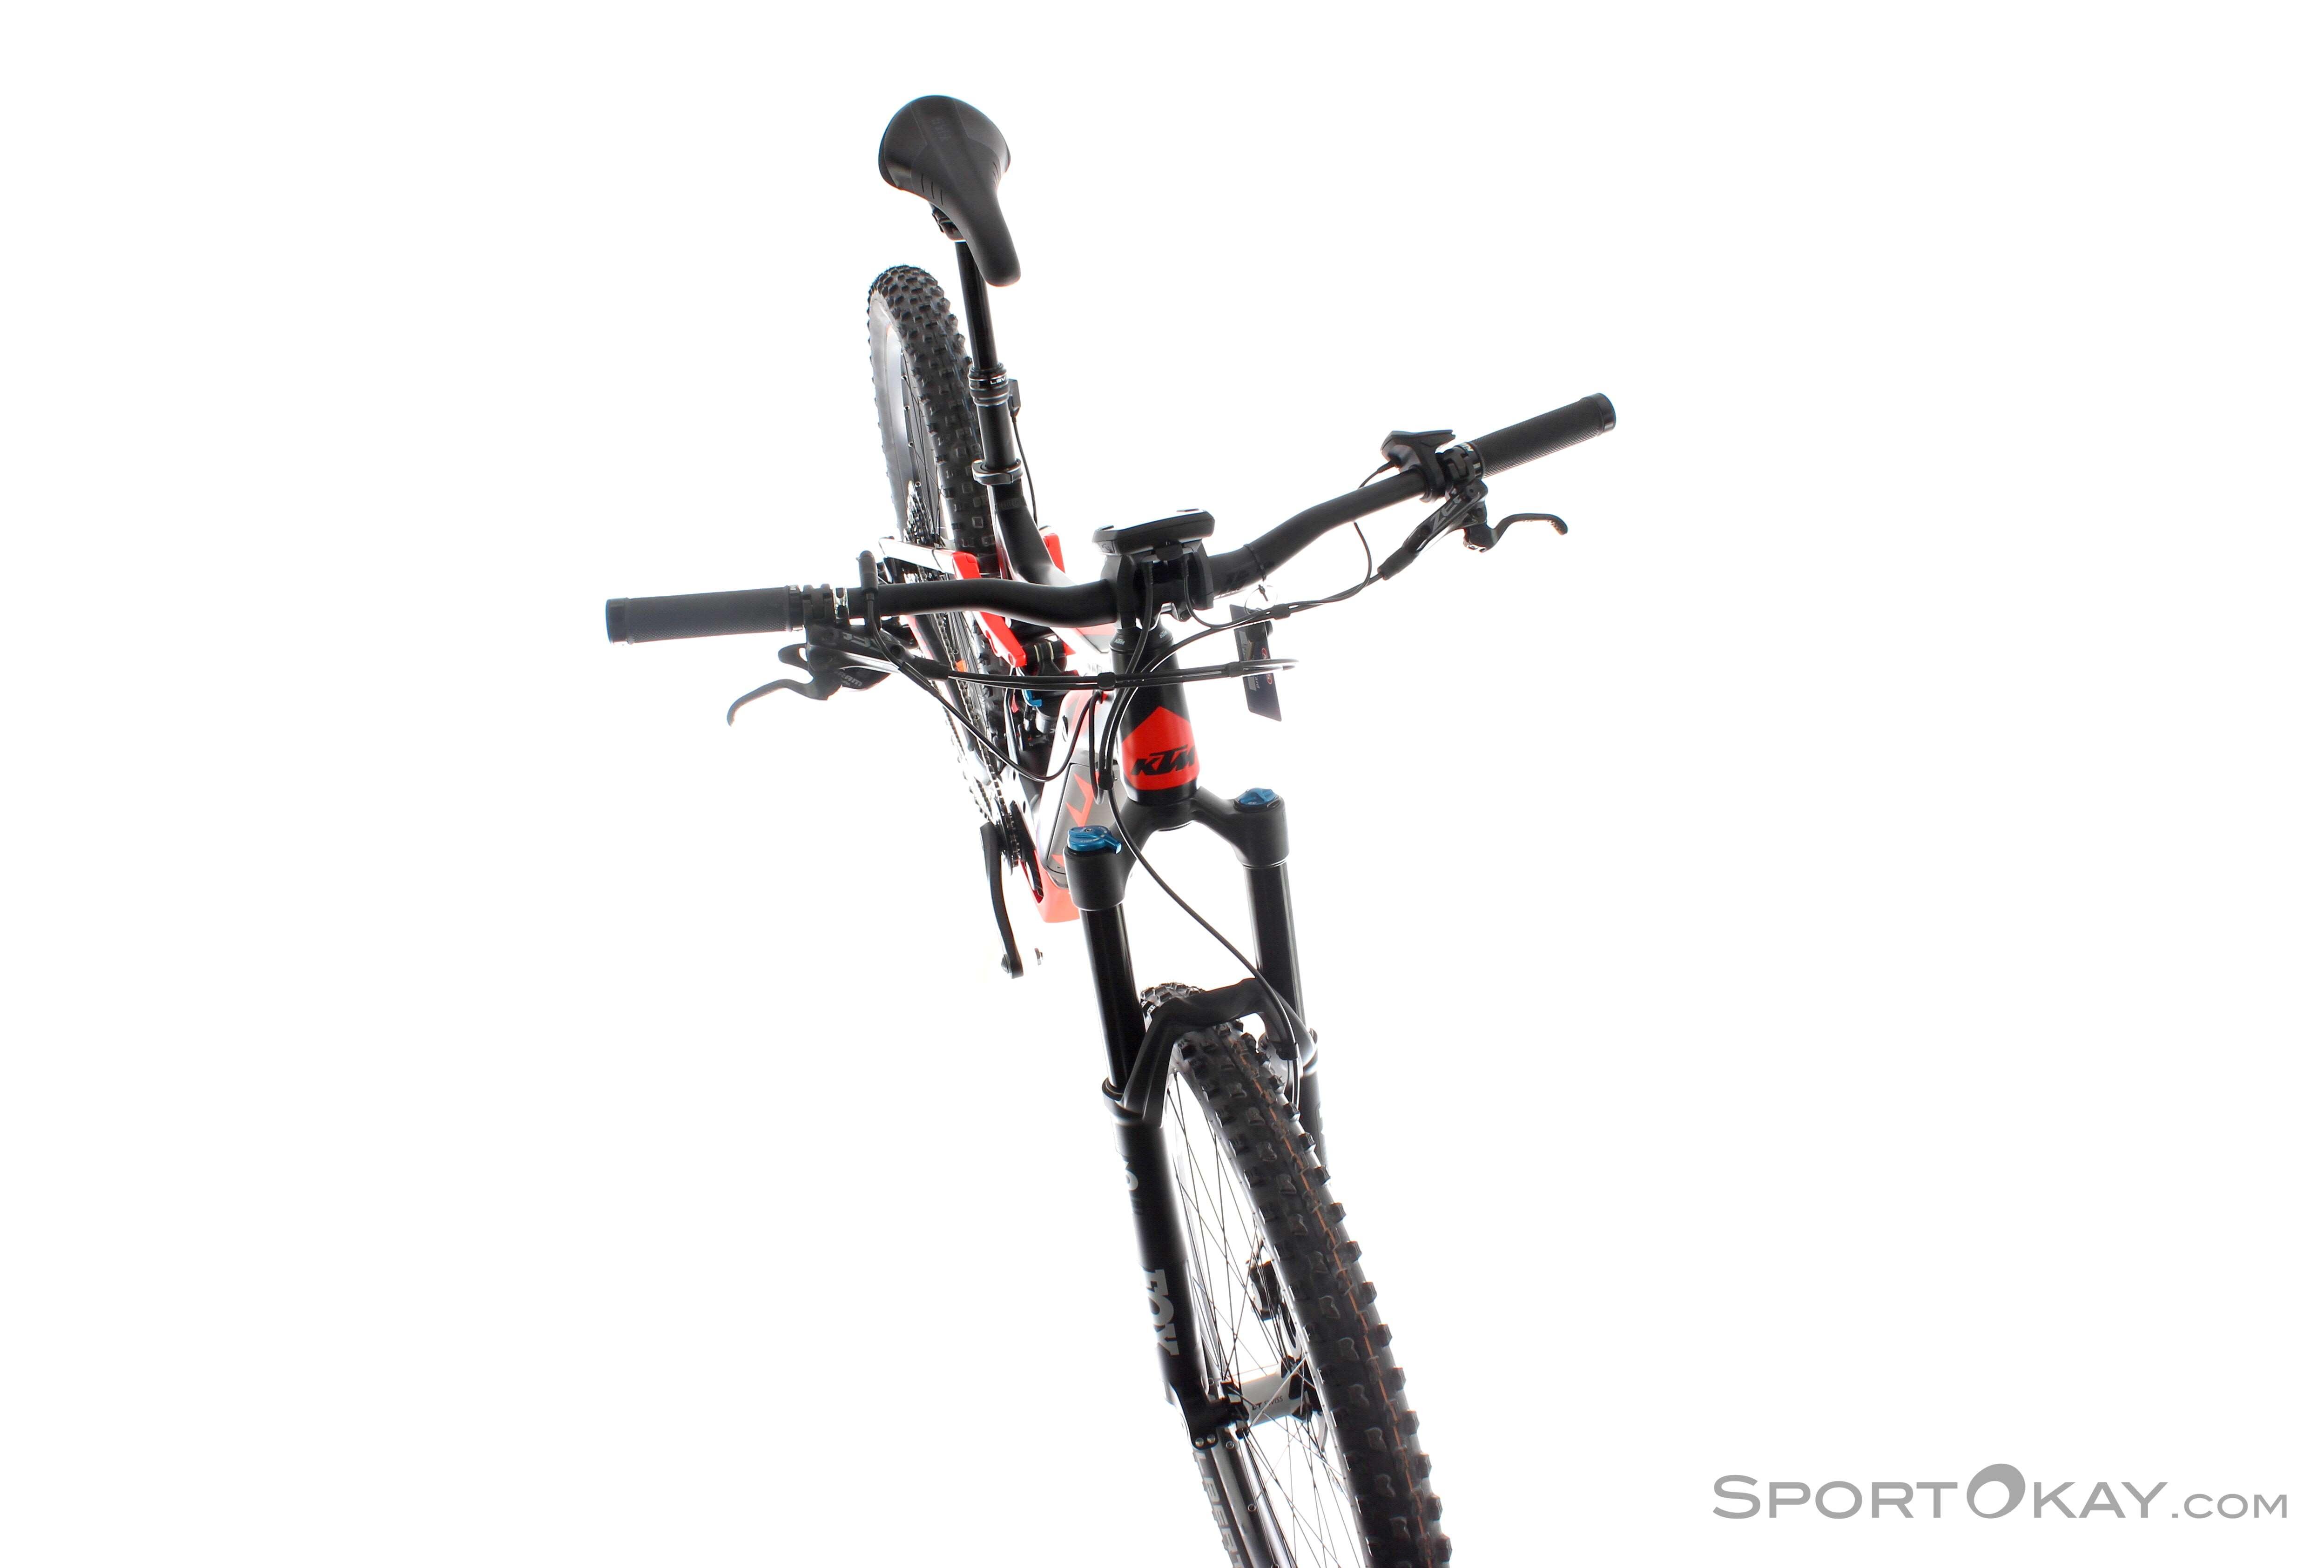 Ktm Macina Kapoho 271 2018 E Bike Enduro Mountain Bike